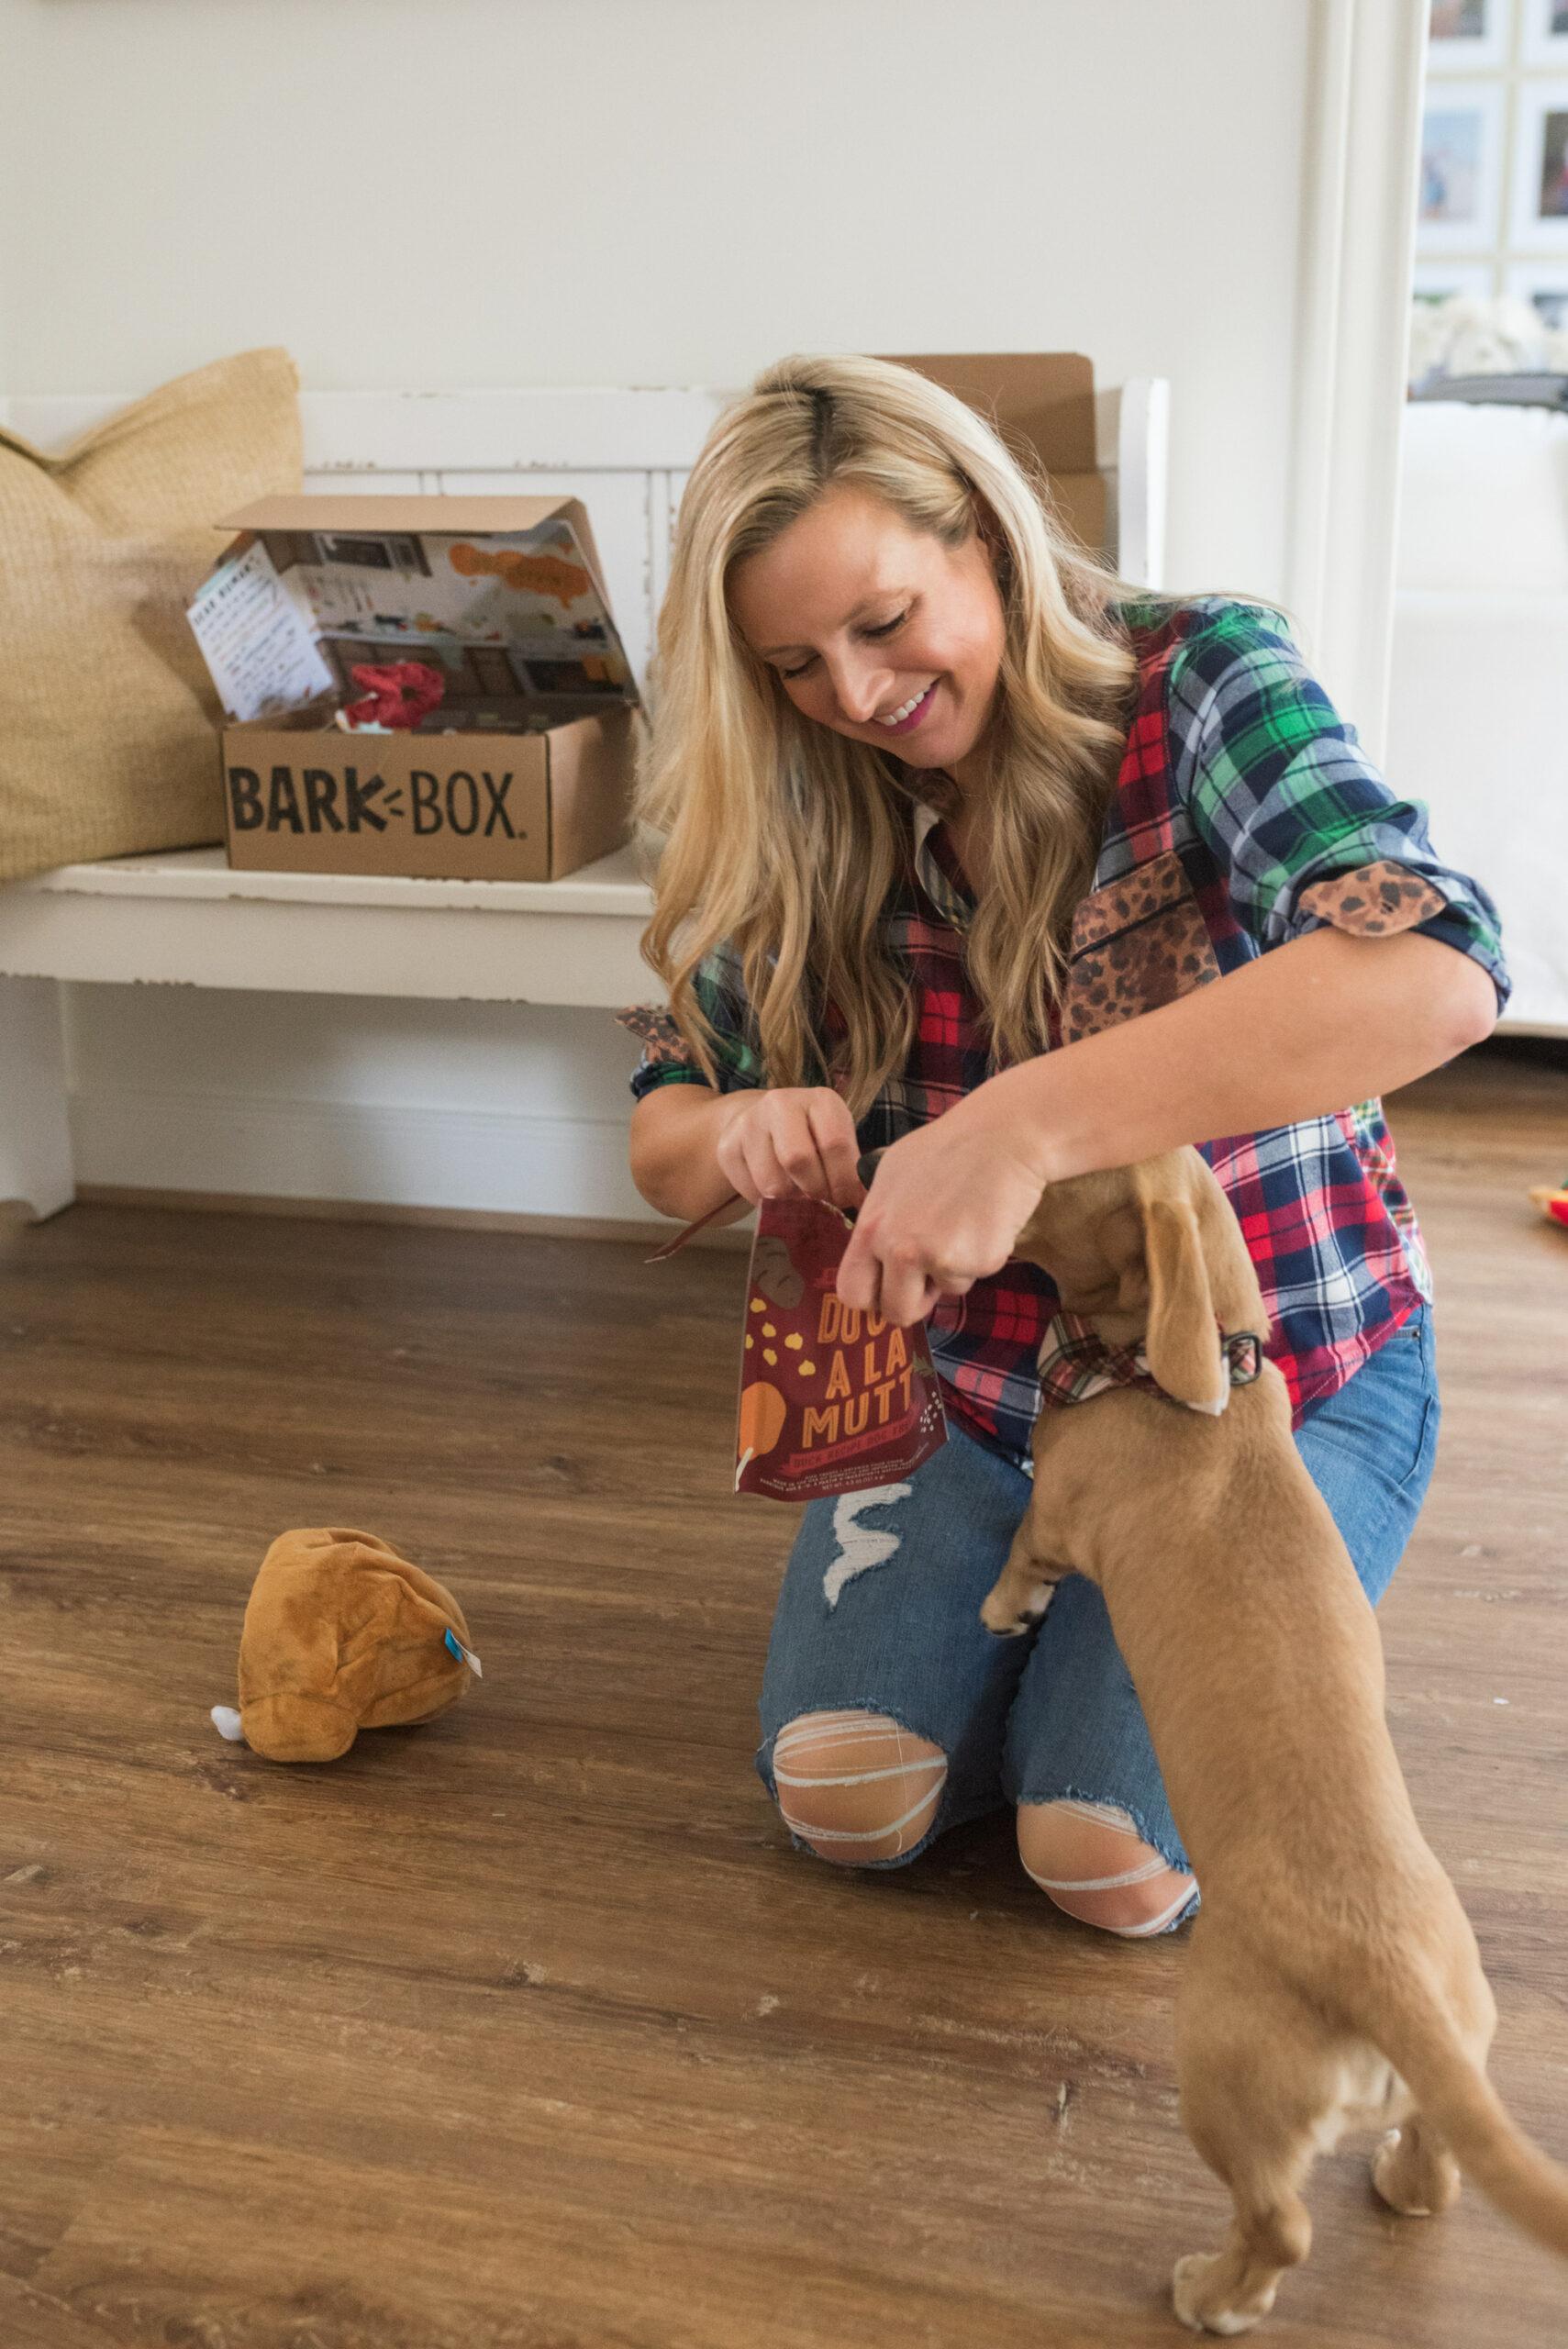 Barkbox Toys by popular Houston lifestyle blog, Fancy Ashley: image of a woman giving her dog some Barkbox treats.